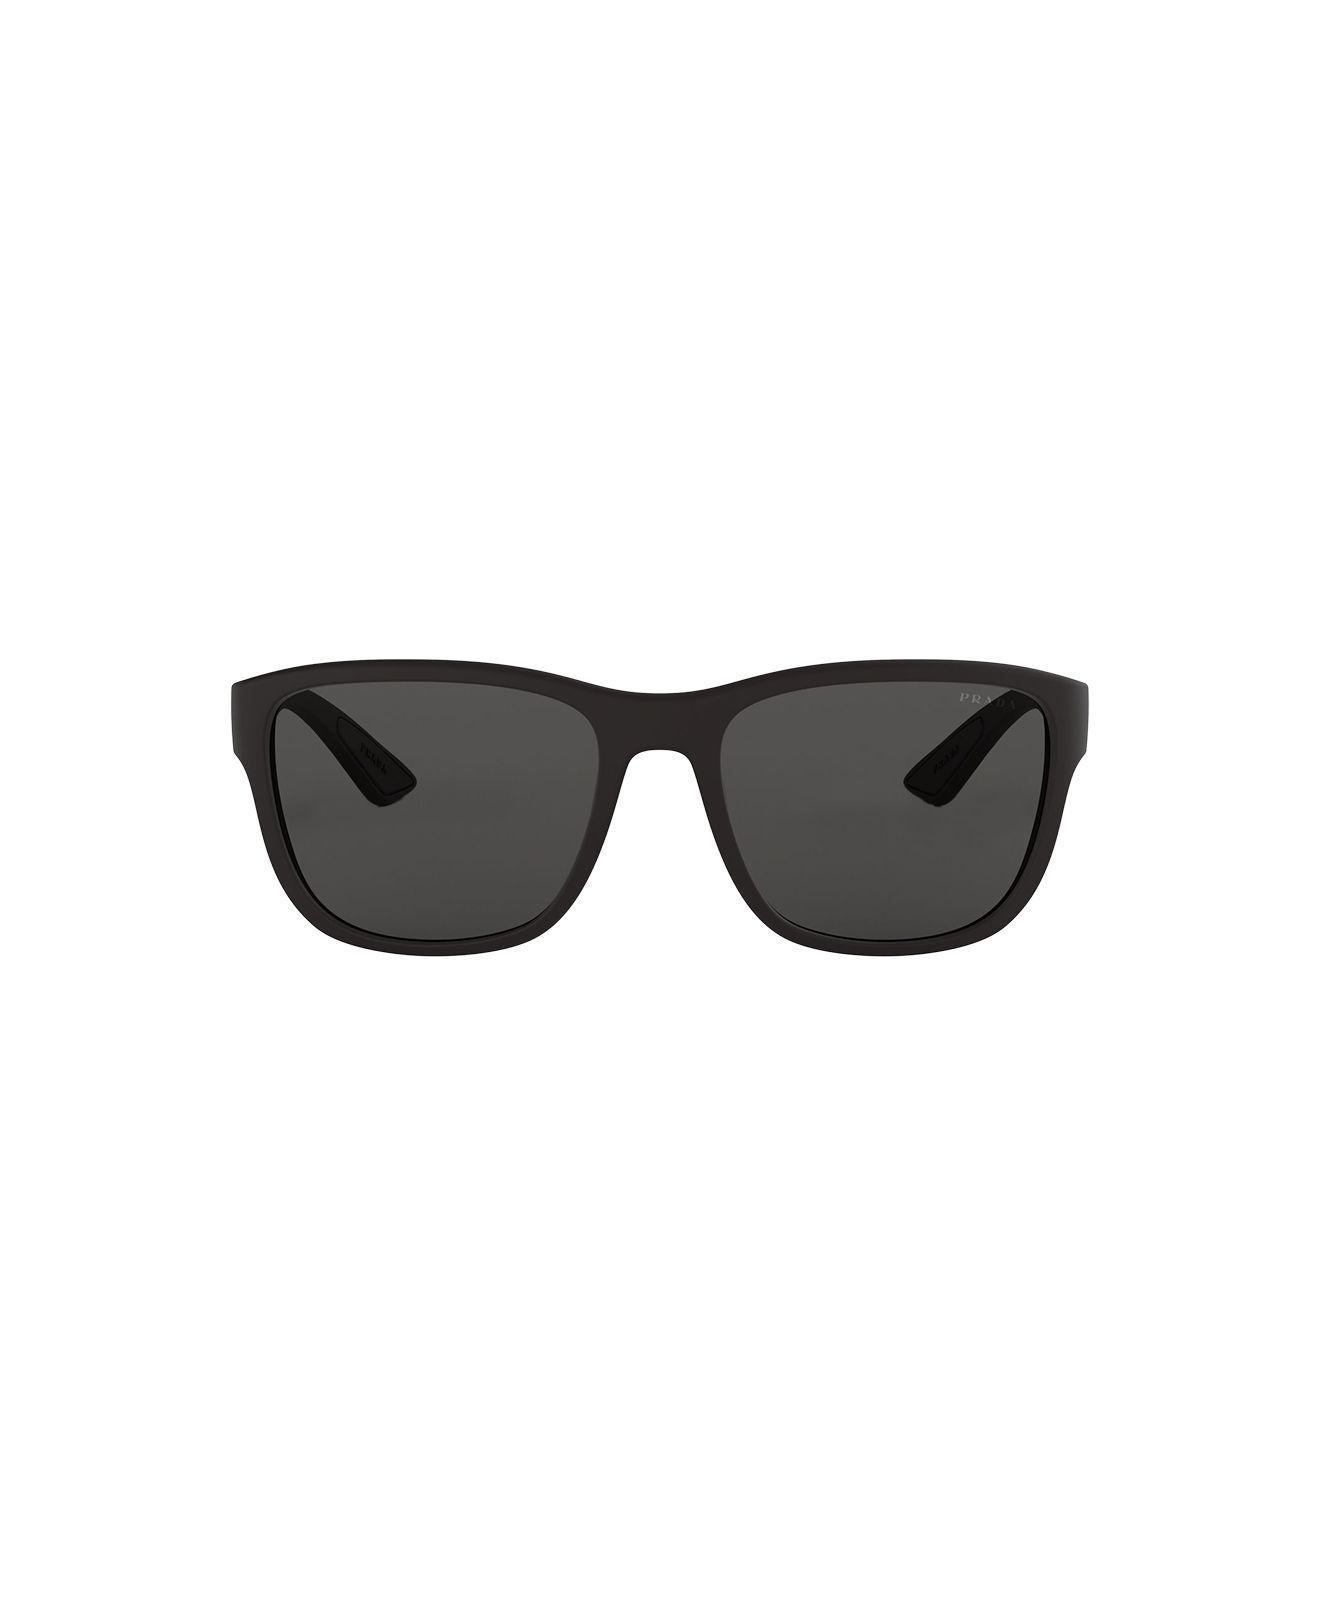 d33127023c Lyst - Prada Ps01us in Black for Men